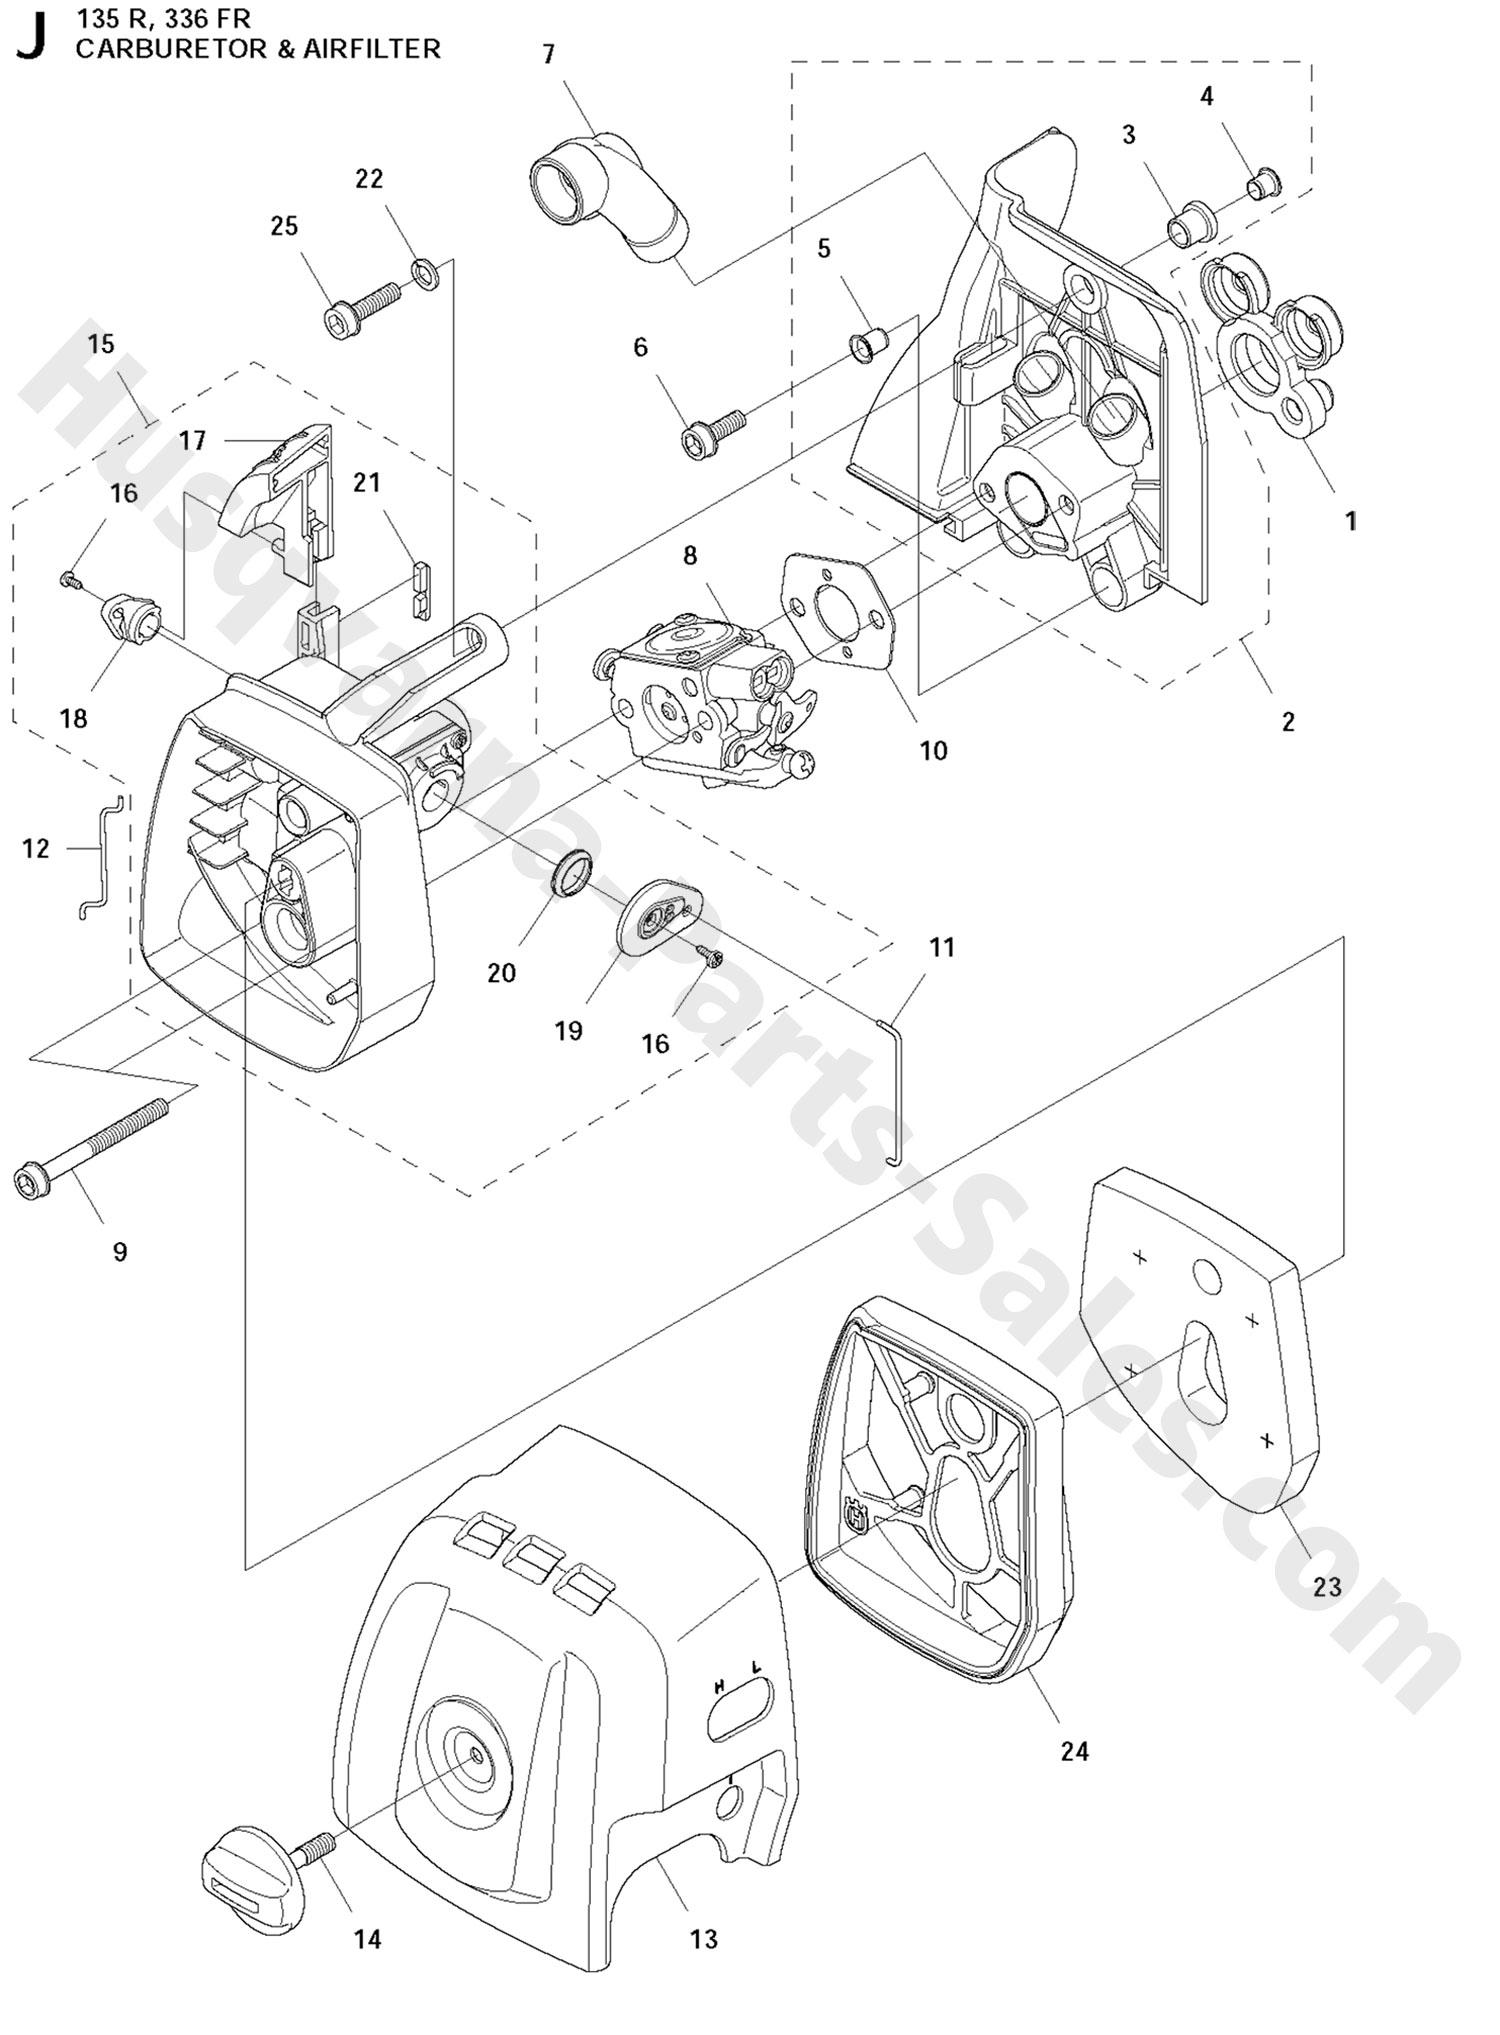 336fr Husqvarna Brushcutter Carburetor Amp Air Filter Parts